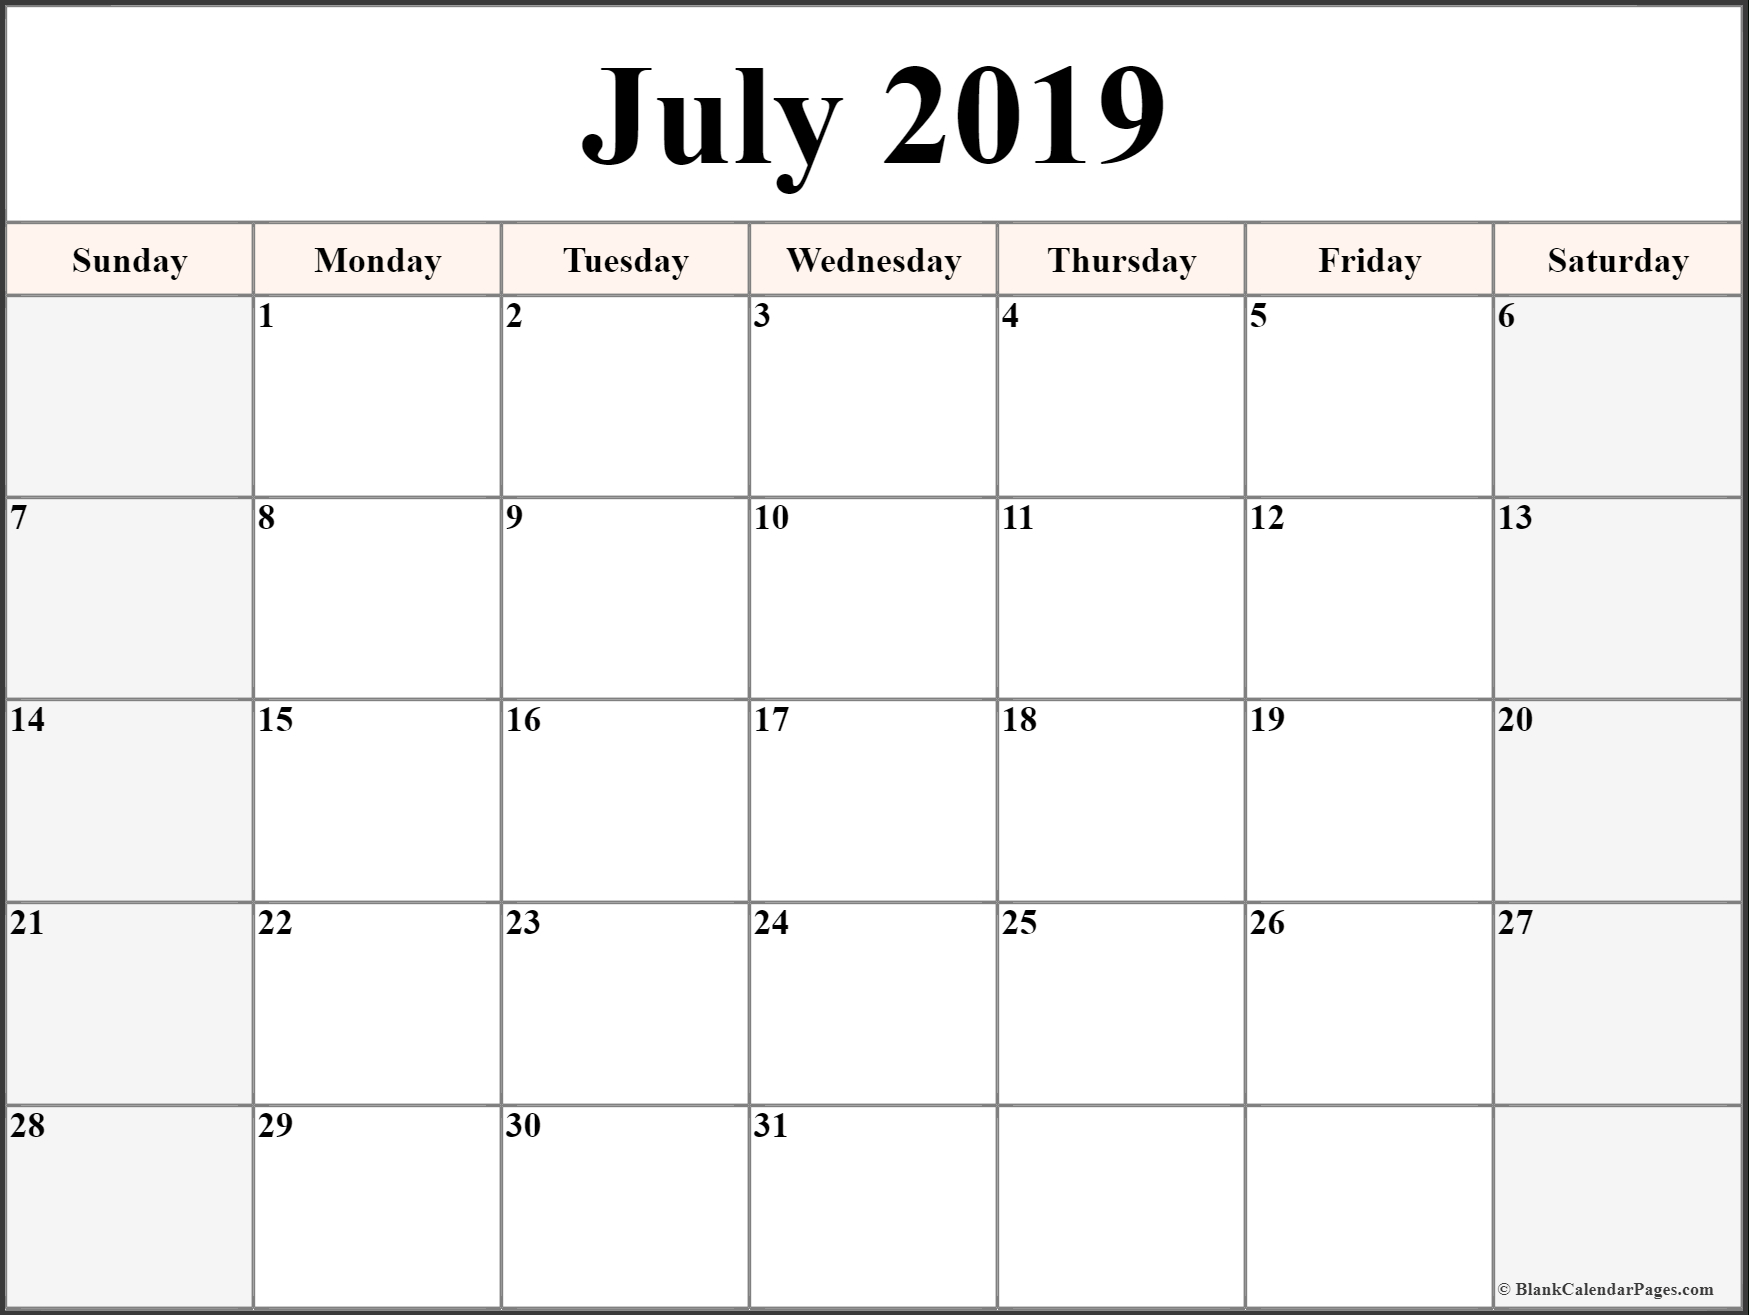 July 2019 Printable Calendar Blank Templates - Calendar Hour